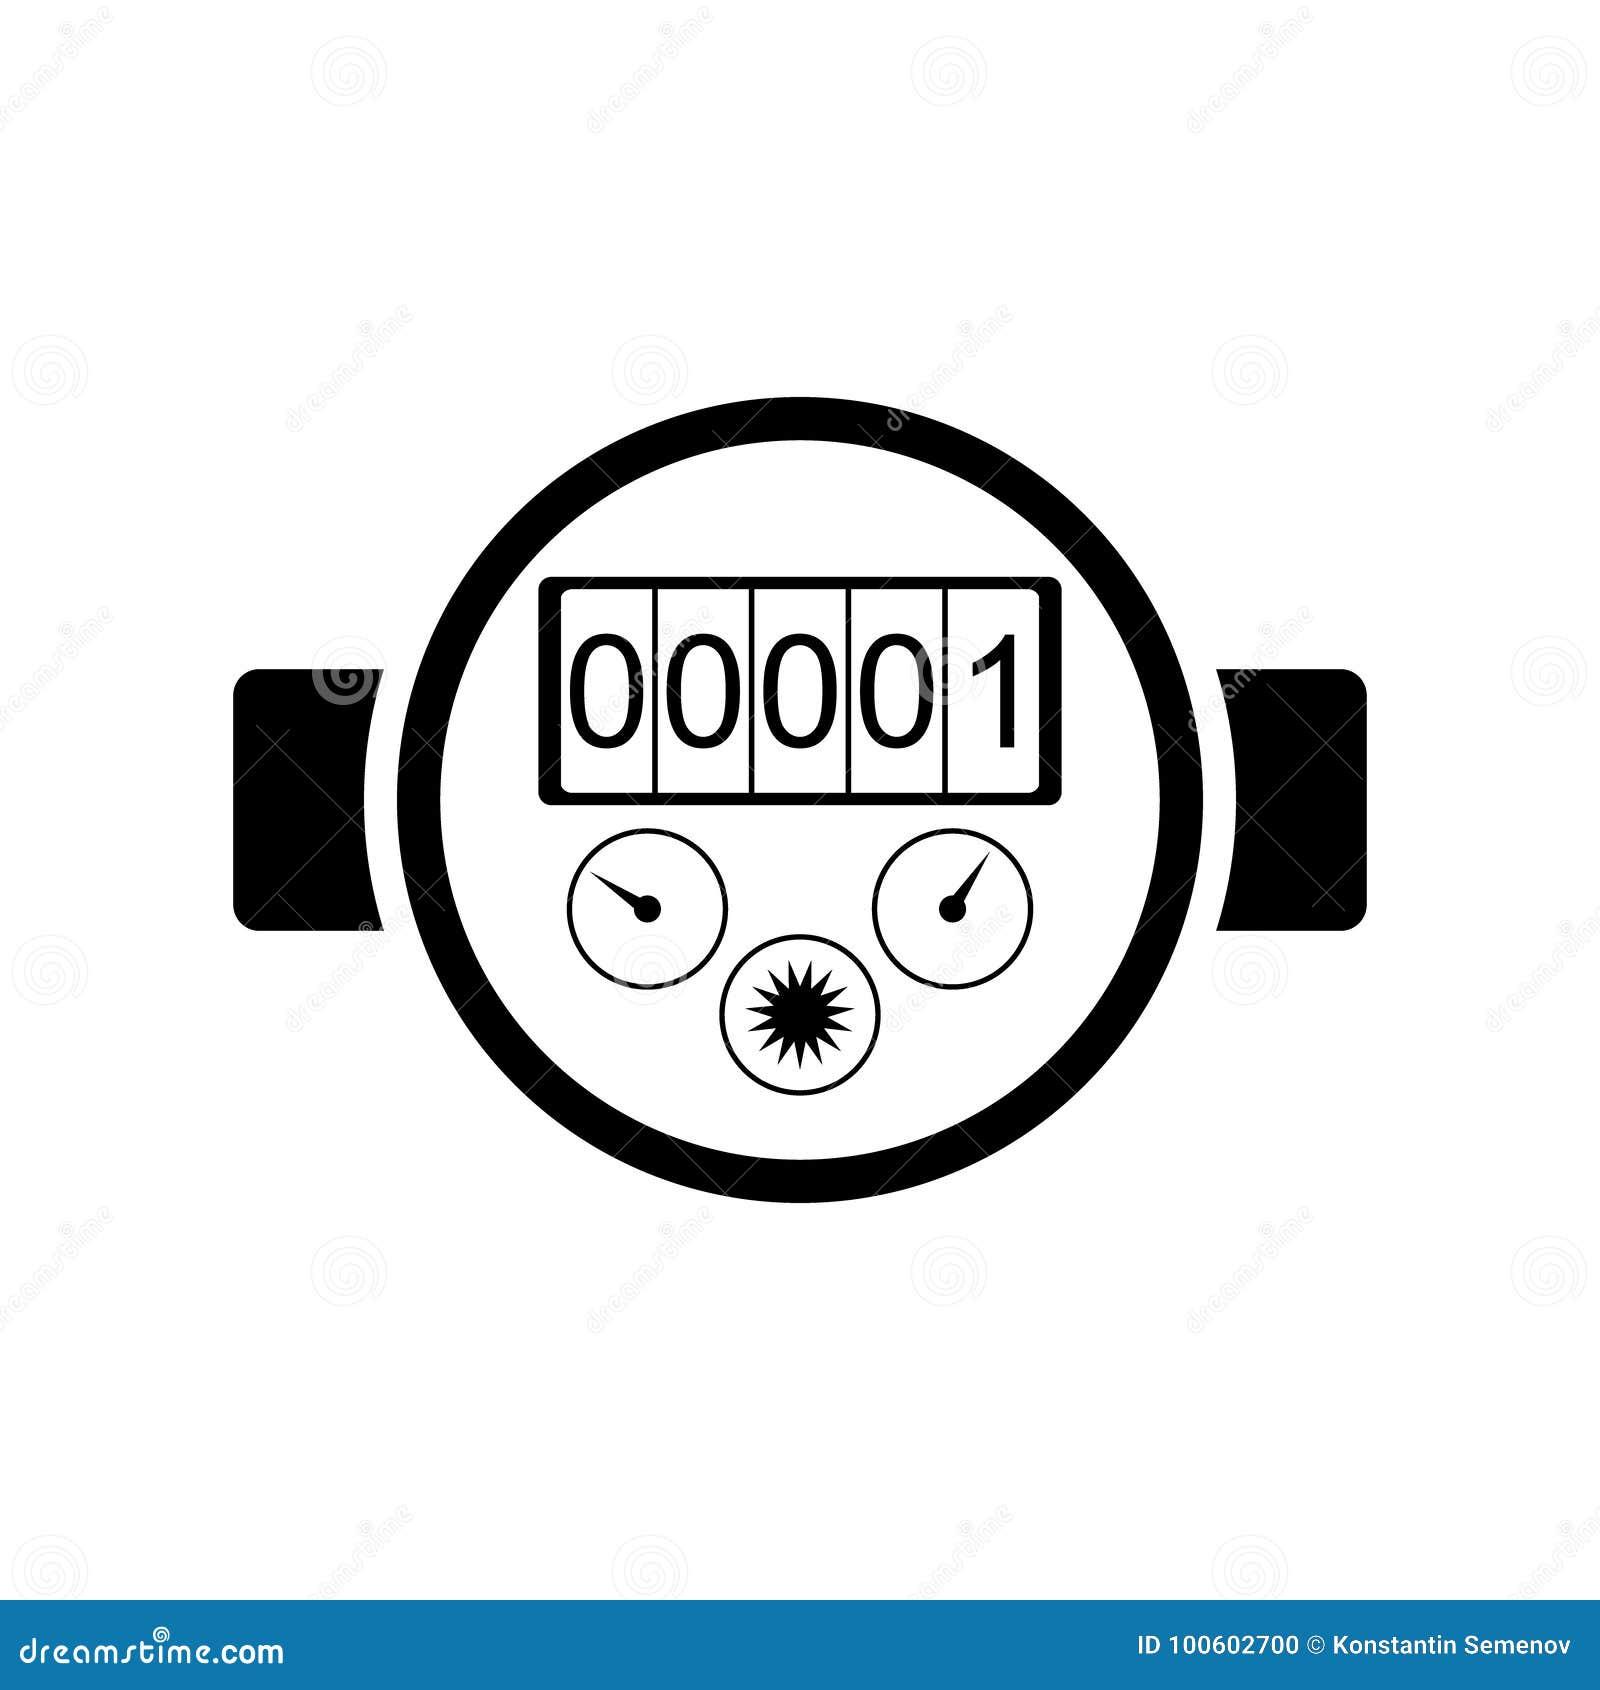 water meter icon  stock illustration  illustration of flow